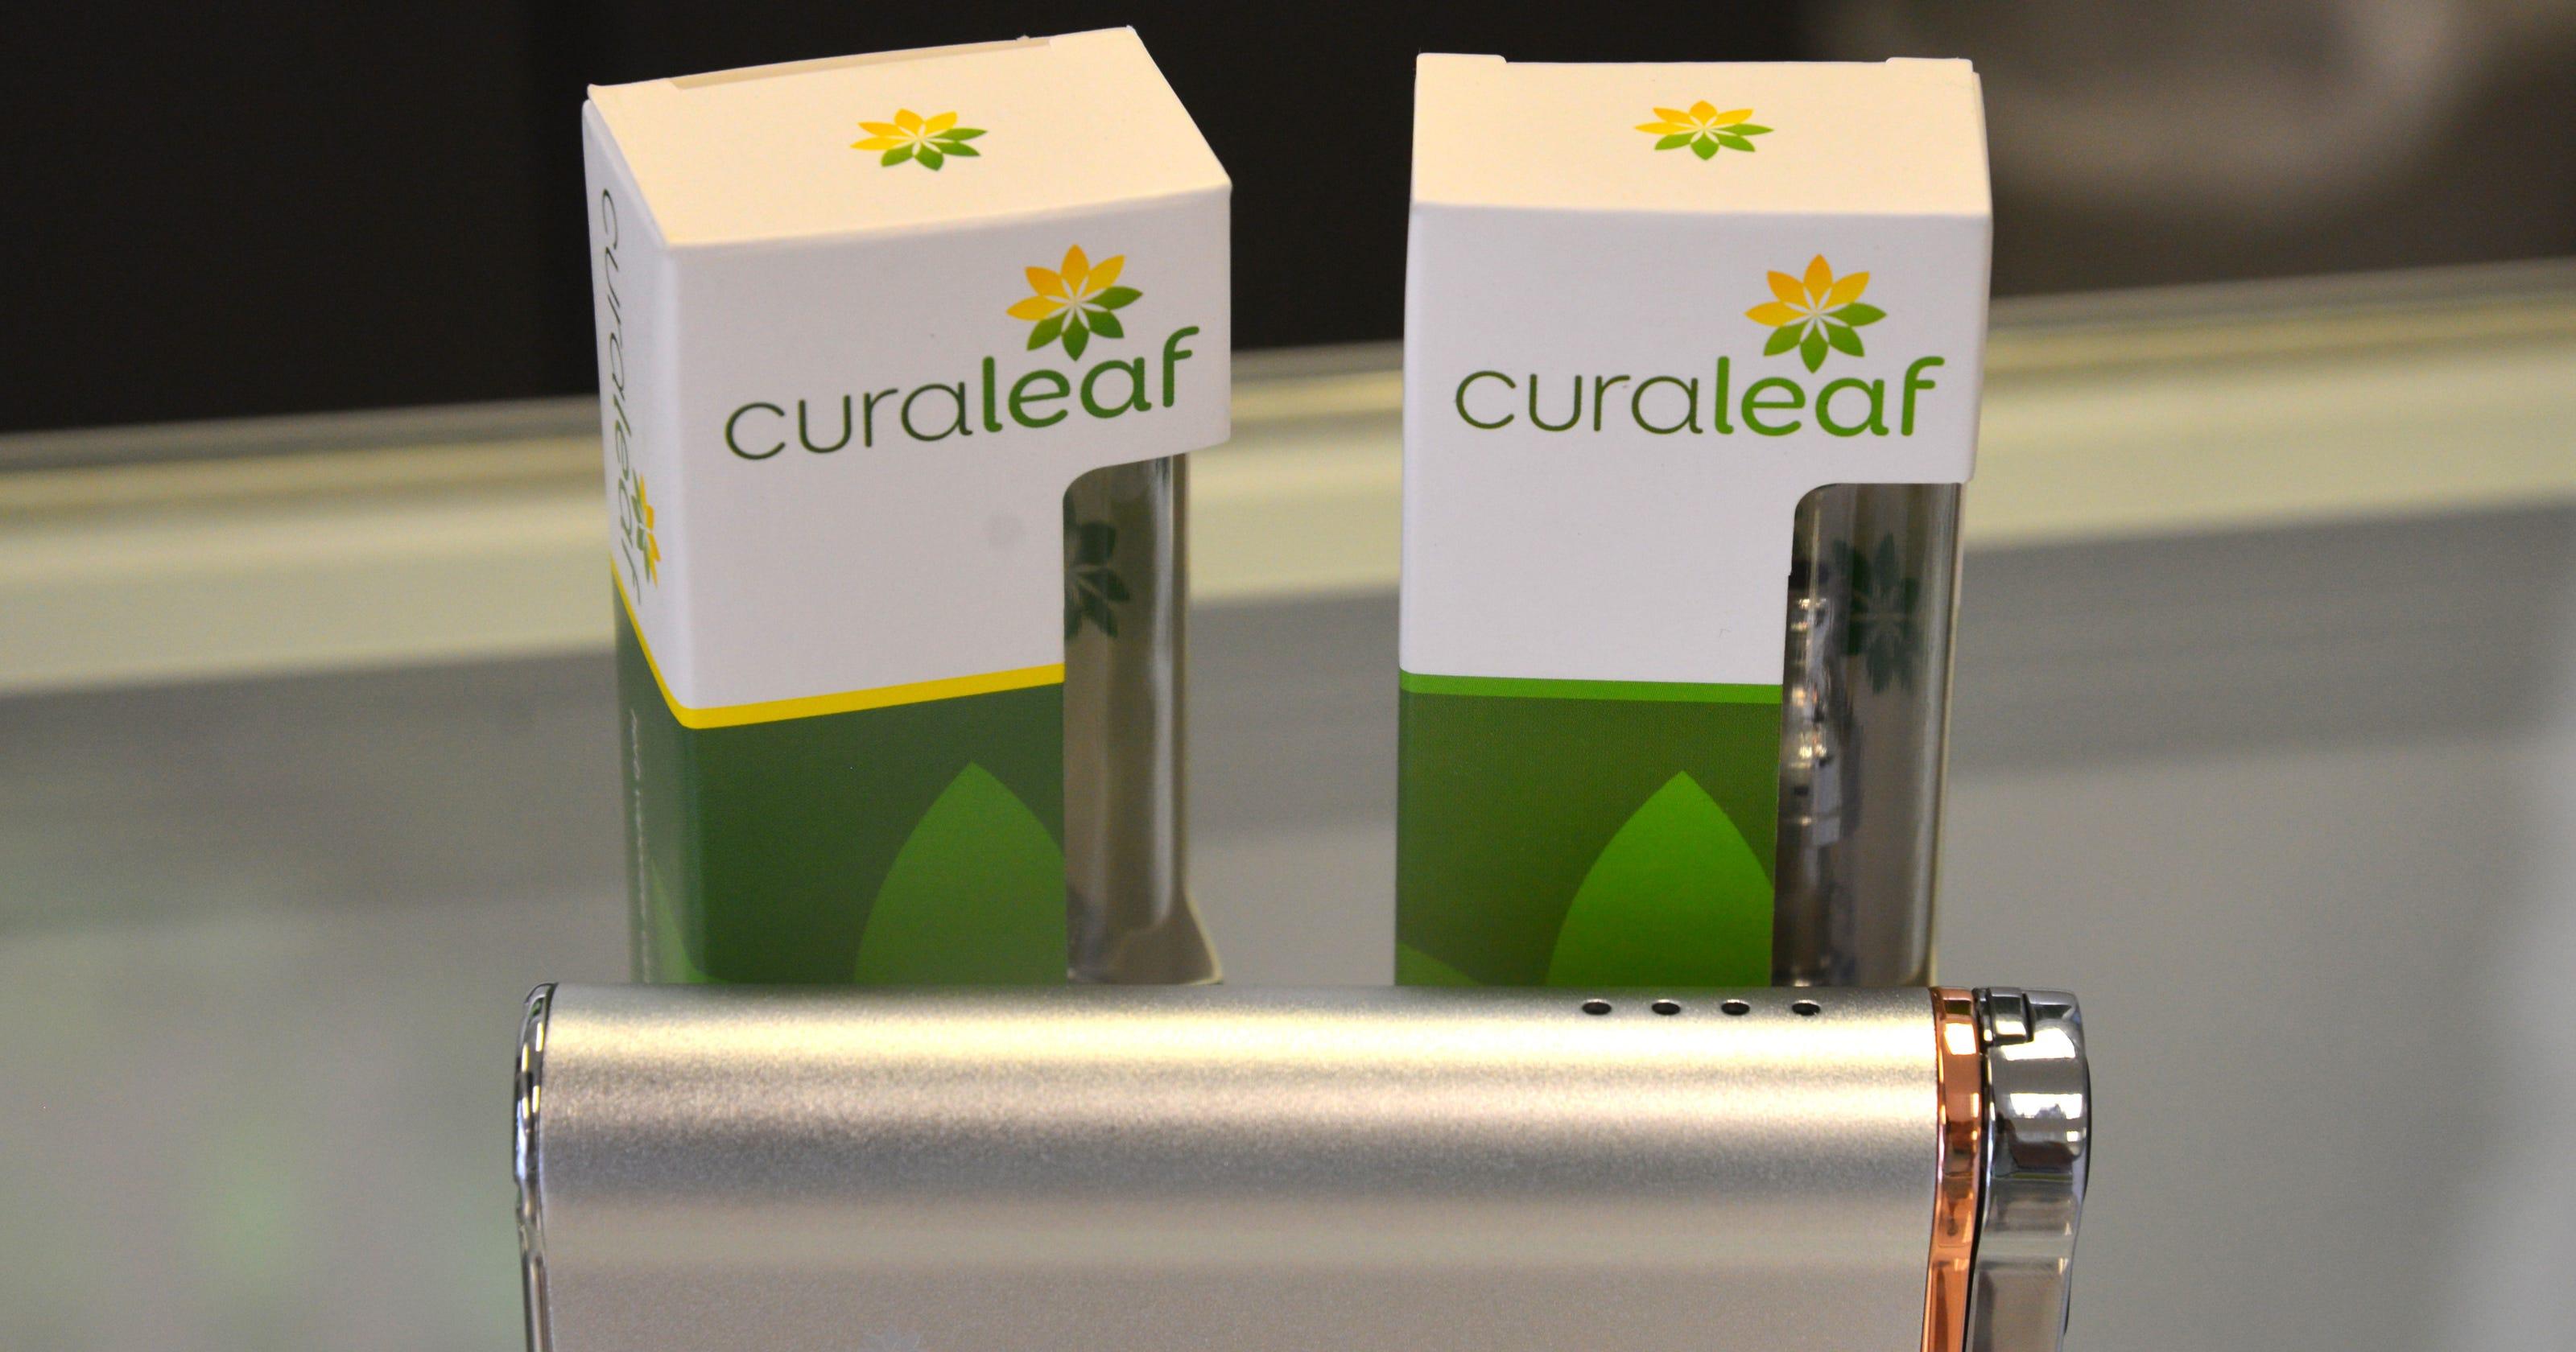 Curaleaf medical marijuana dispensary to open in Fort pierce